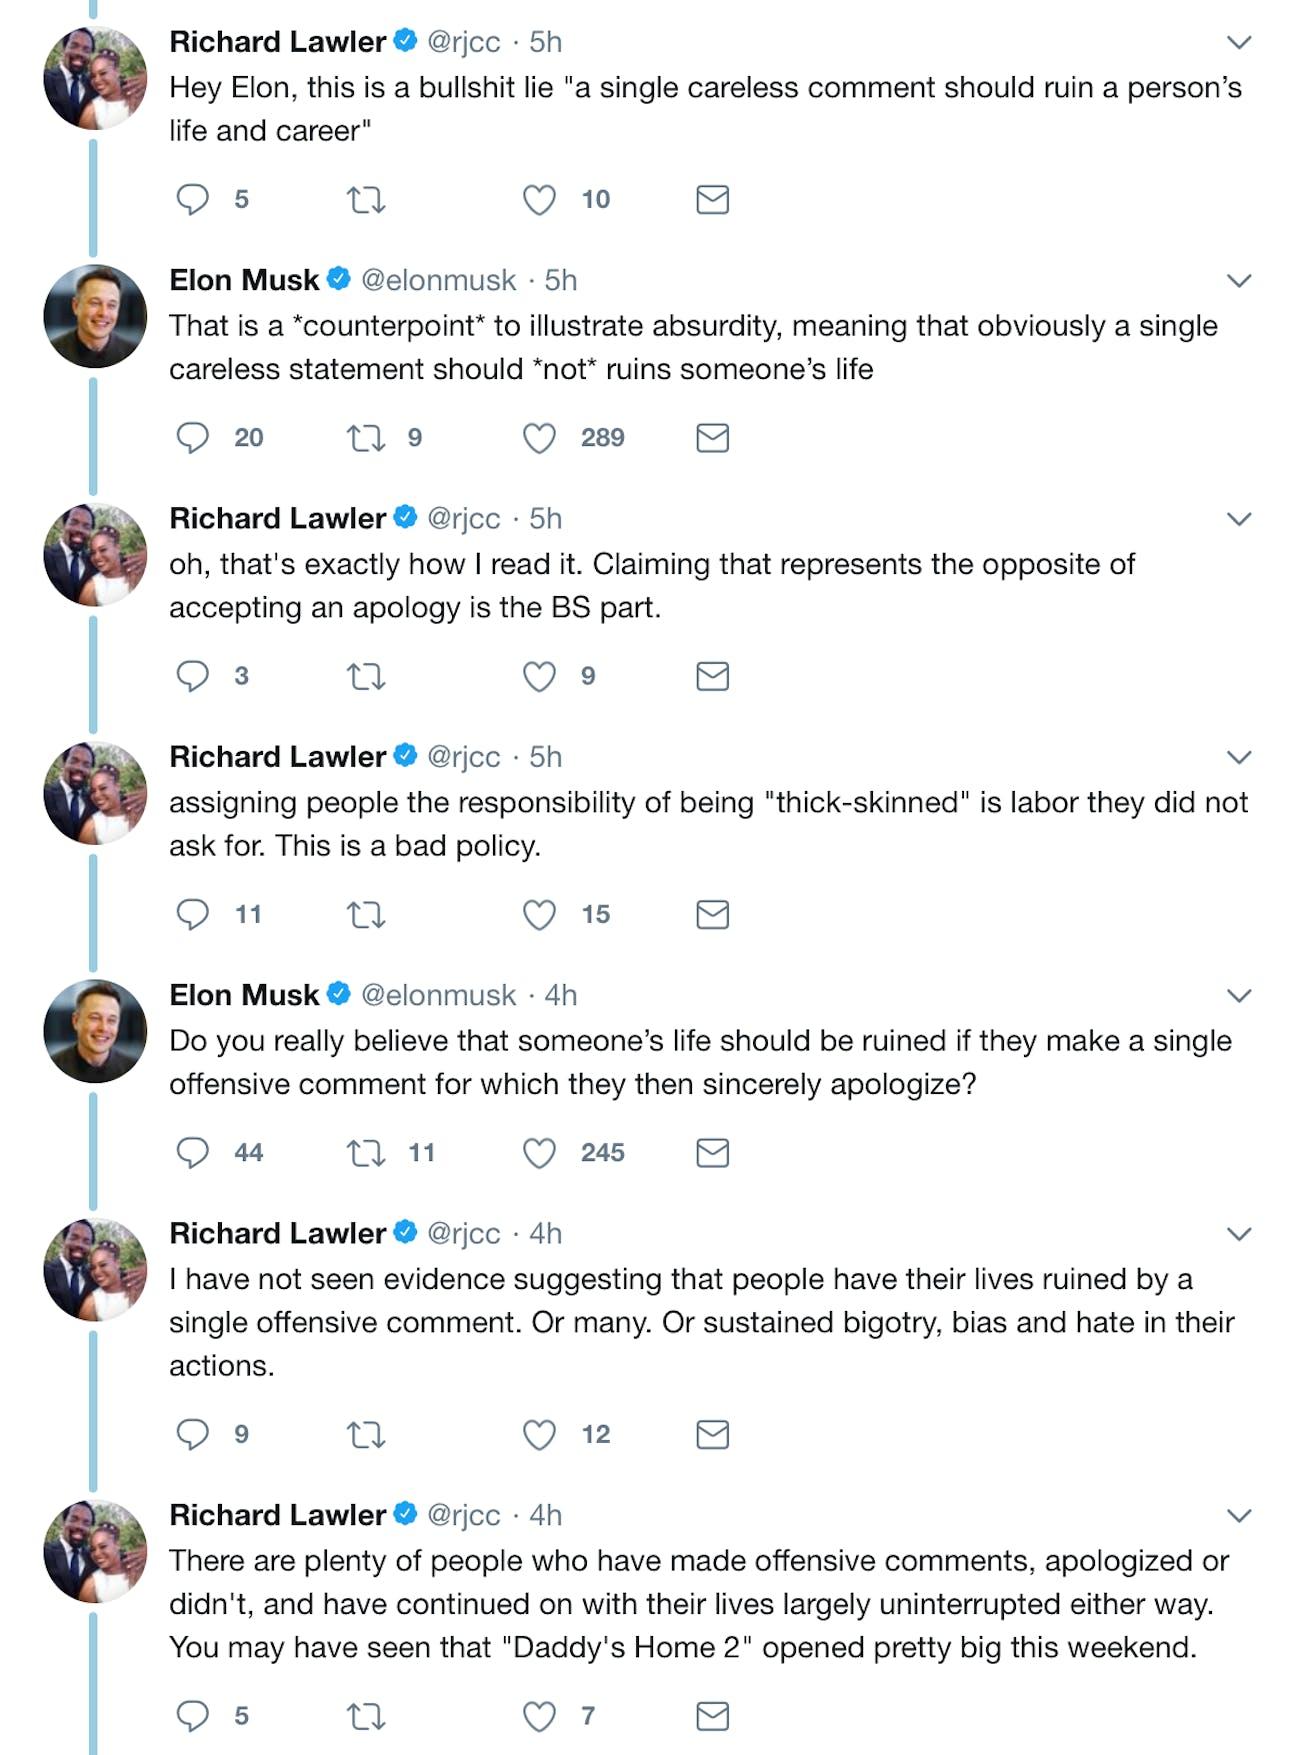 The exchange between Lawler and Musk.